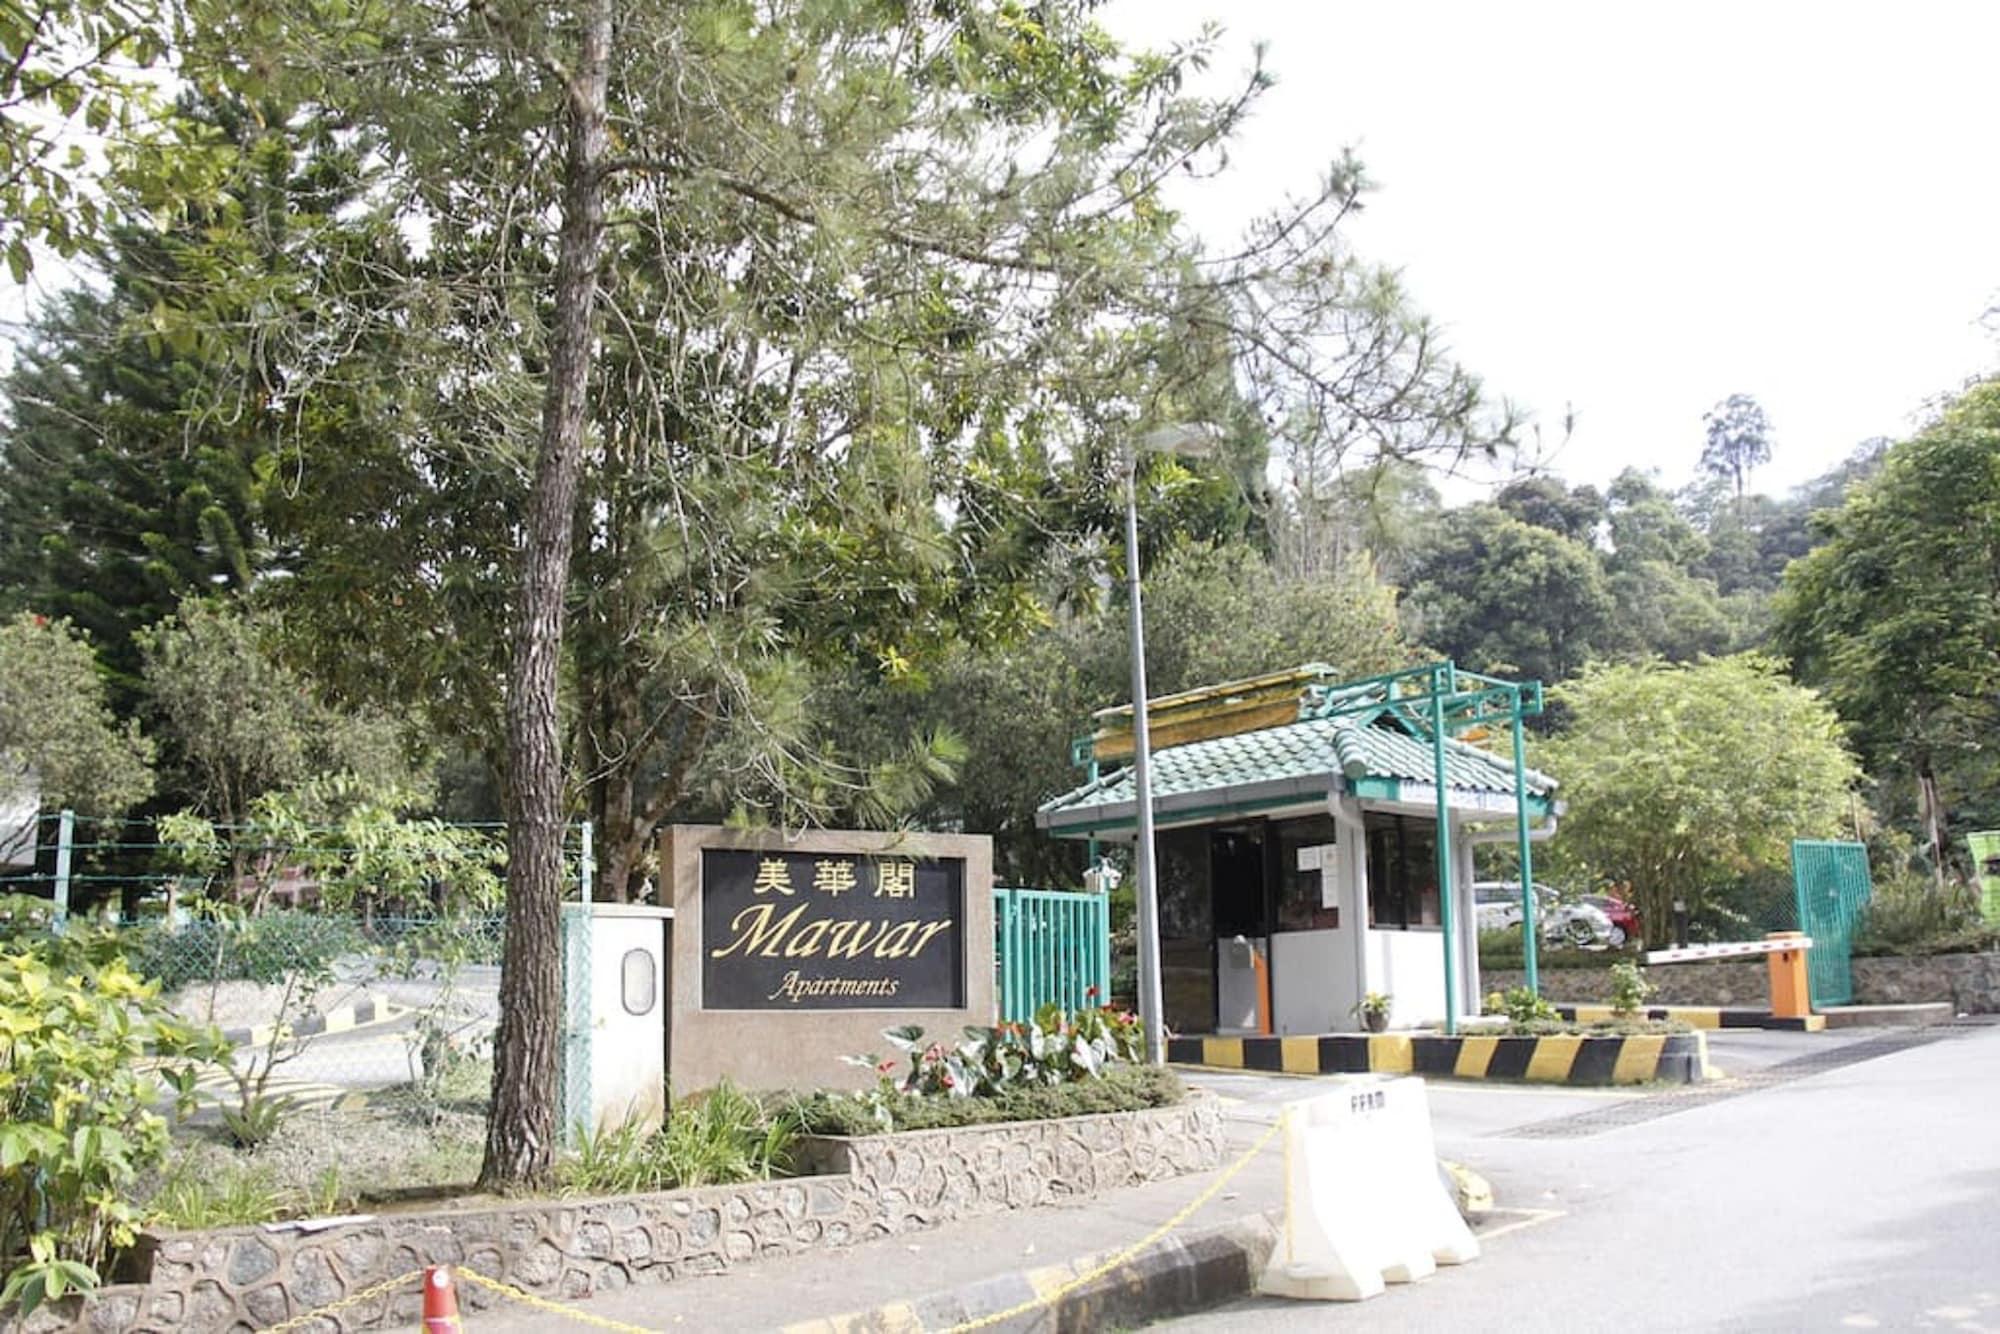 Gohtong Jaya Genting Highland Apartment, Bentong